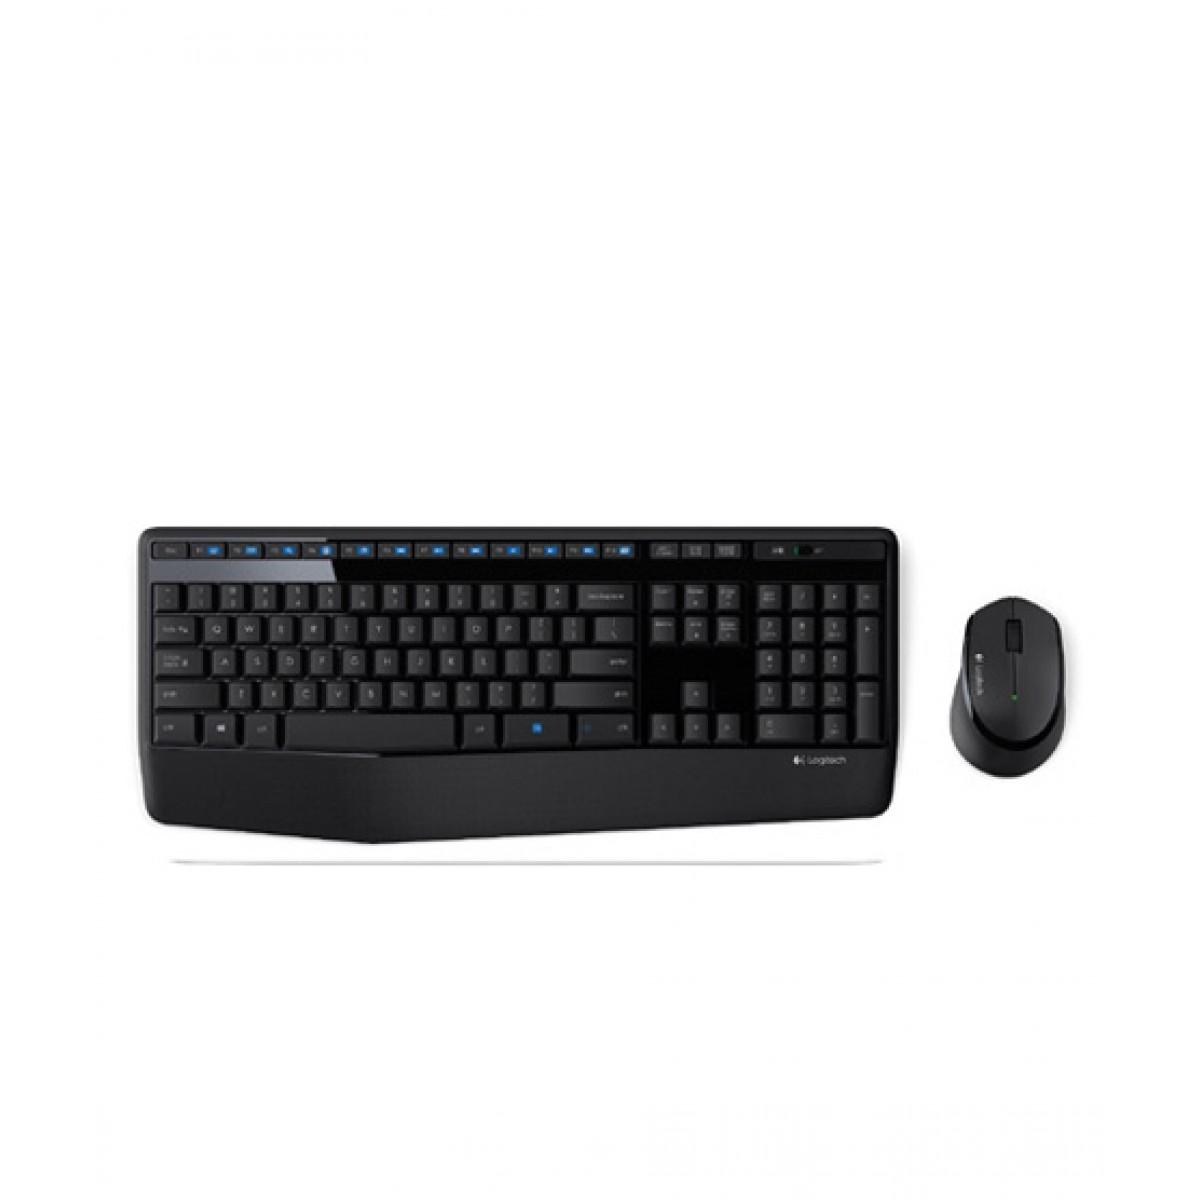 282a2d9ac3f Logitech MK345 Wireless Keyboard And Mouse Price in Pakistan | Buy Logitech  MK345 Wireless Combo Keyboard And Mouse (920-006491) | iShopping.pk